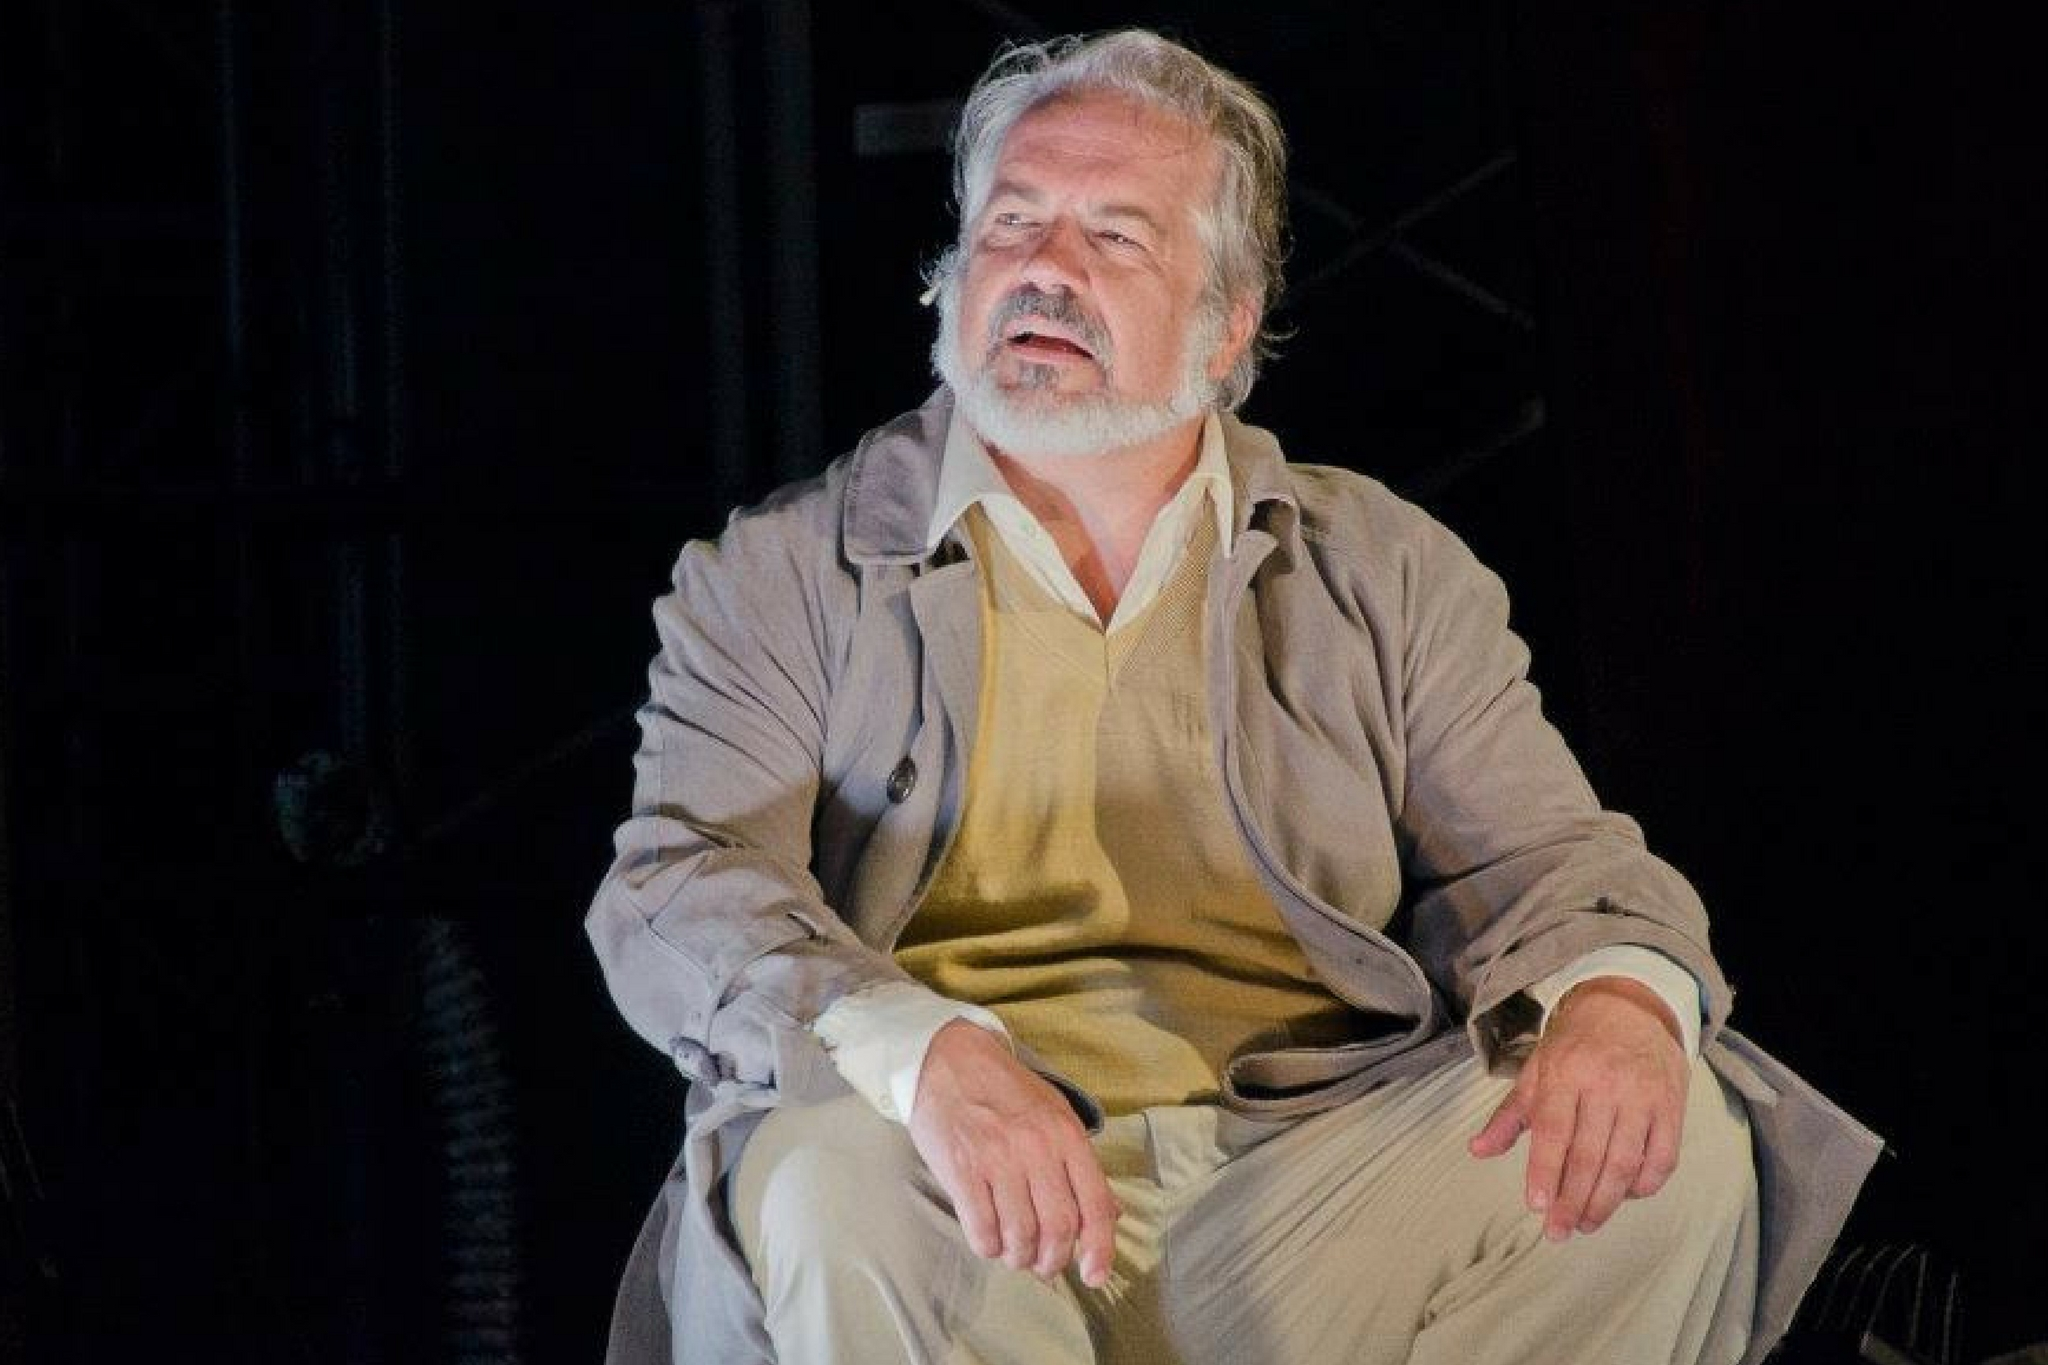 Fred Sullivan, Jr. (Menenius Agrippa) in Coriolanus, Shakespeare on the Common 2012-Photo by Andrew Brilliant